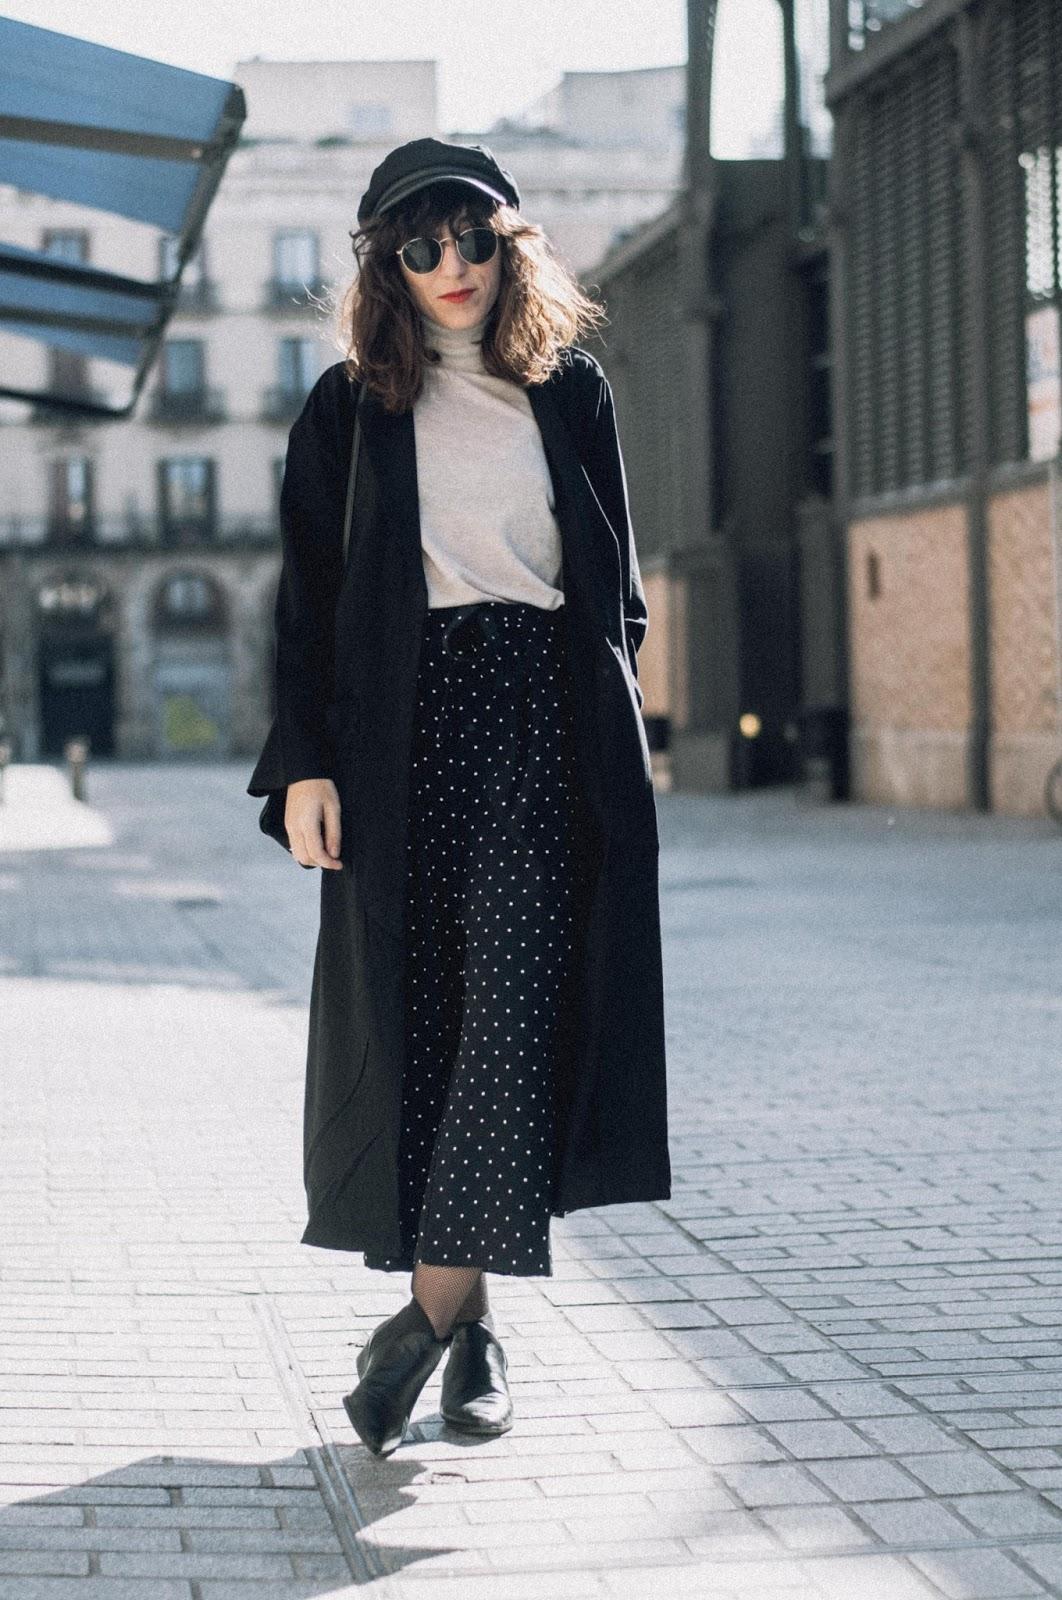 Pantalón culotte Zara, abrigo H&M, botienes Mango, gorro Asos